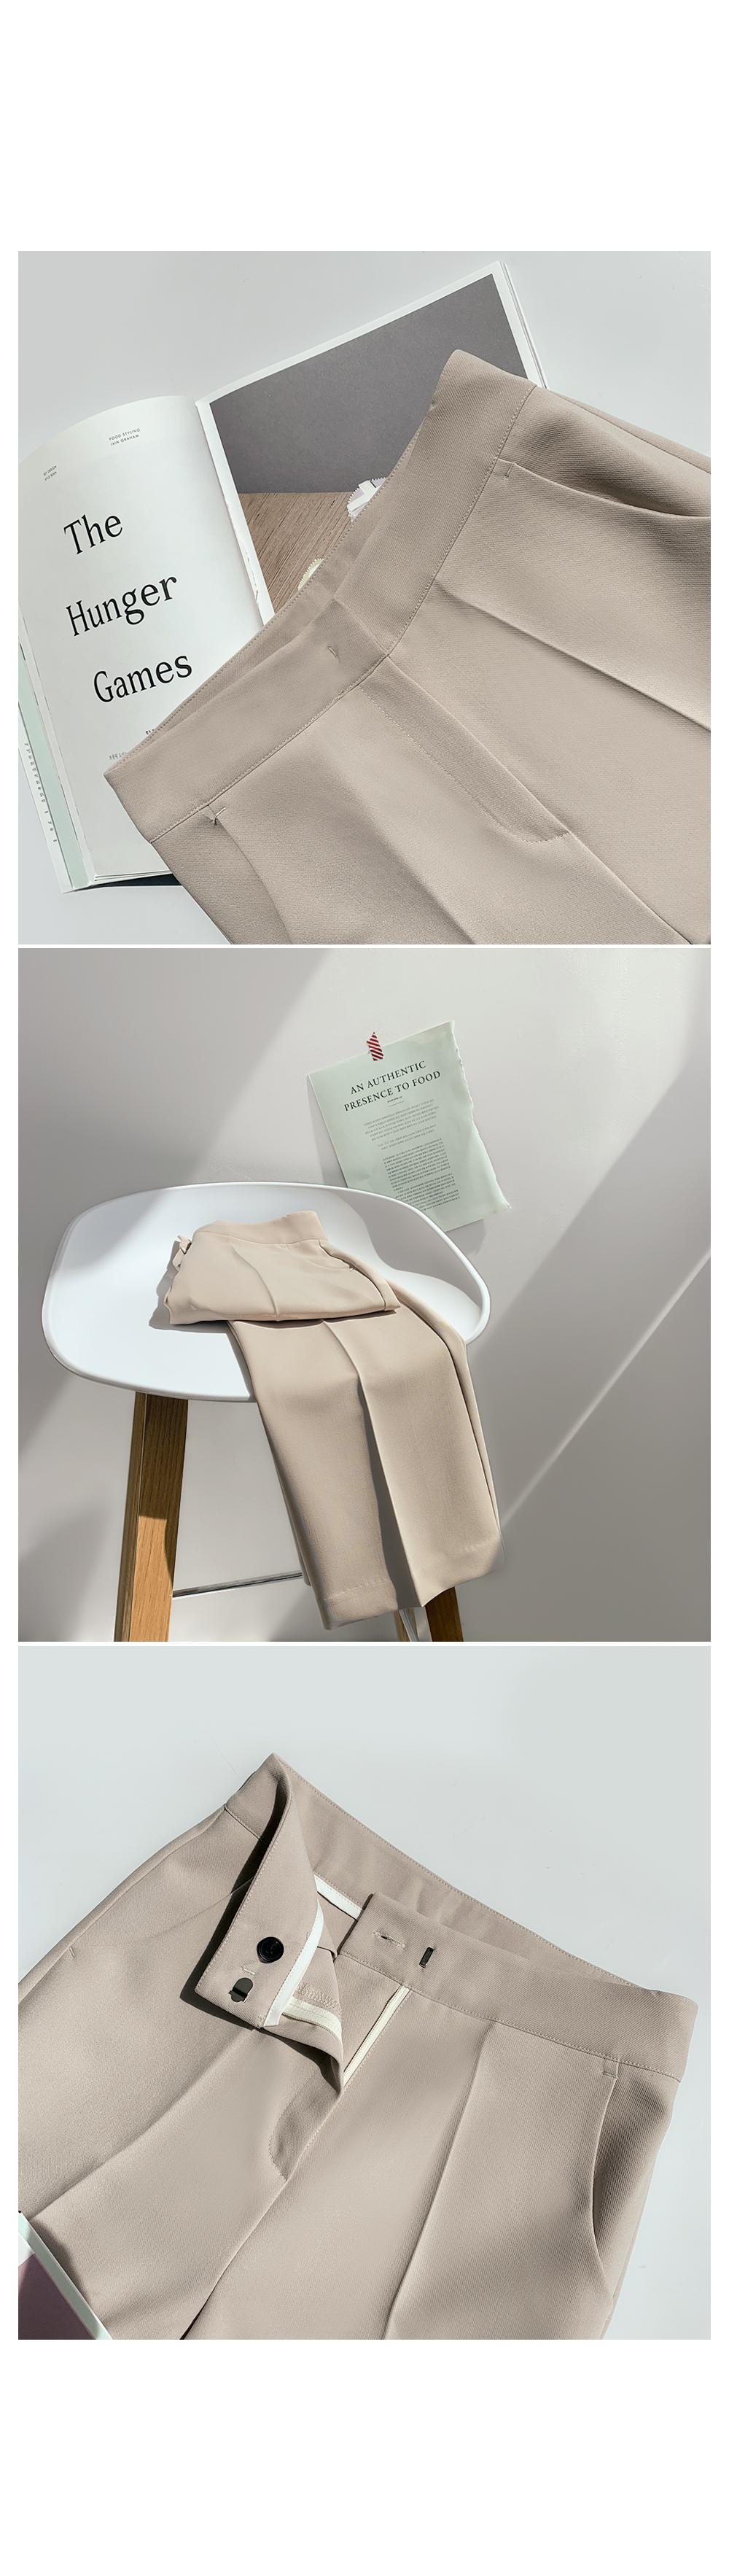 Urban Perfect Fit Trousers-holiholic.com